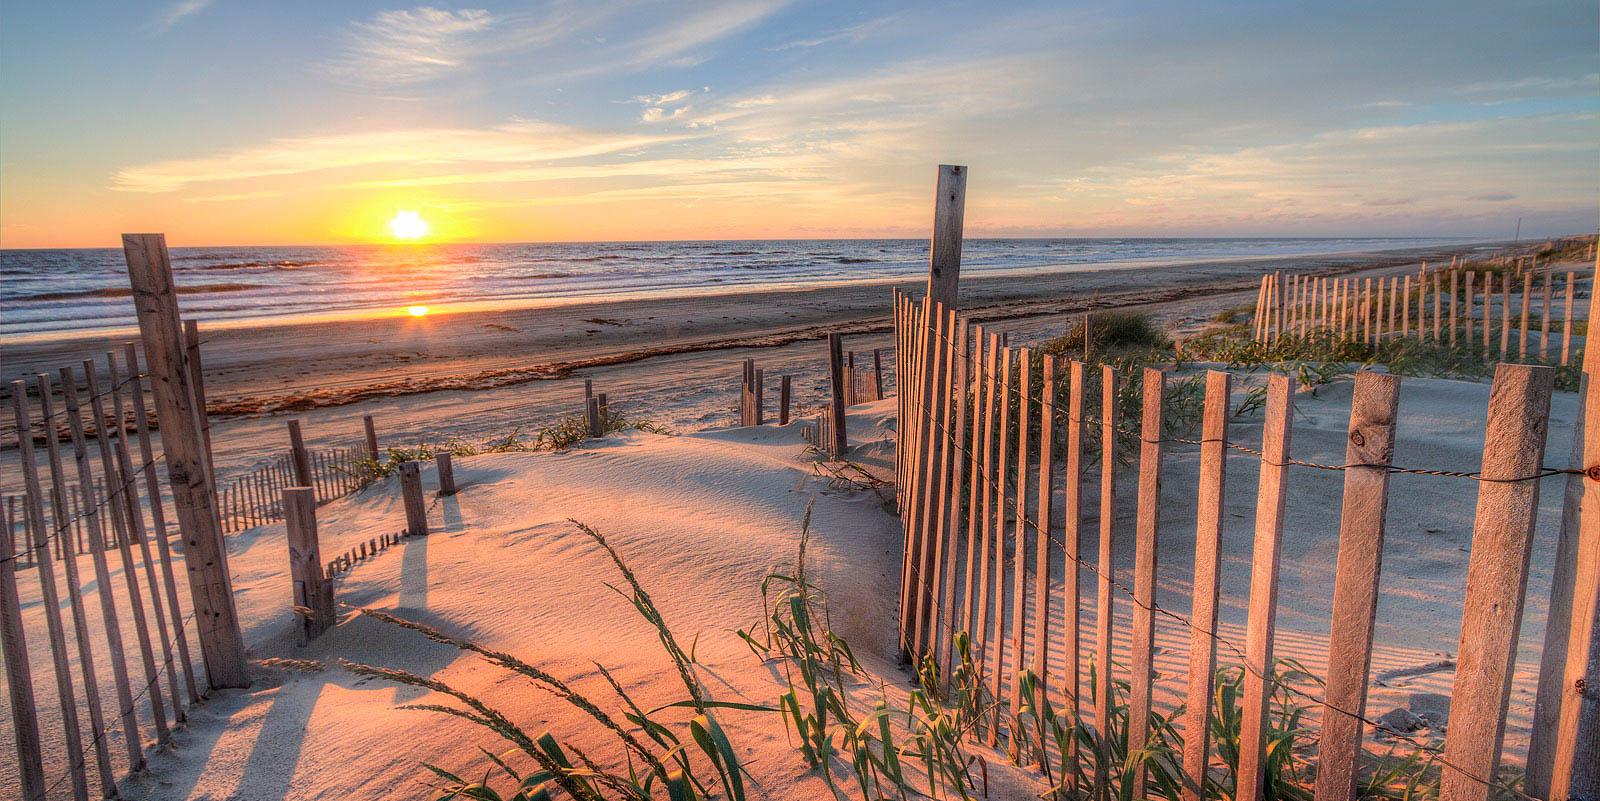 Sunset in Wilmington, NC